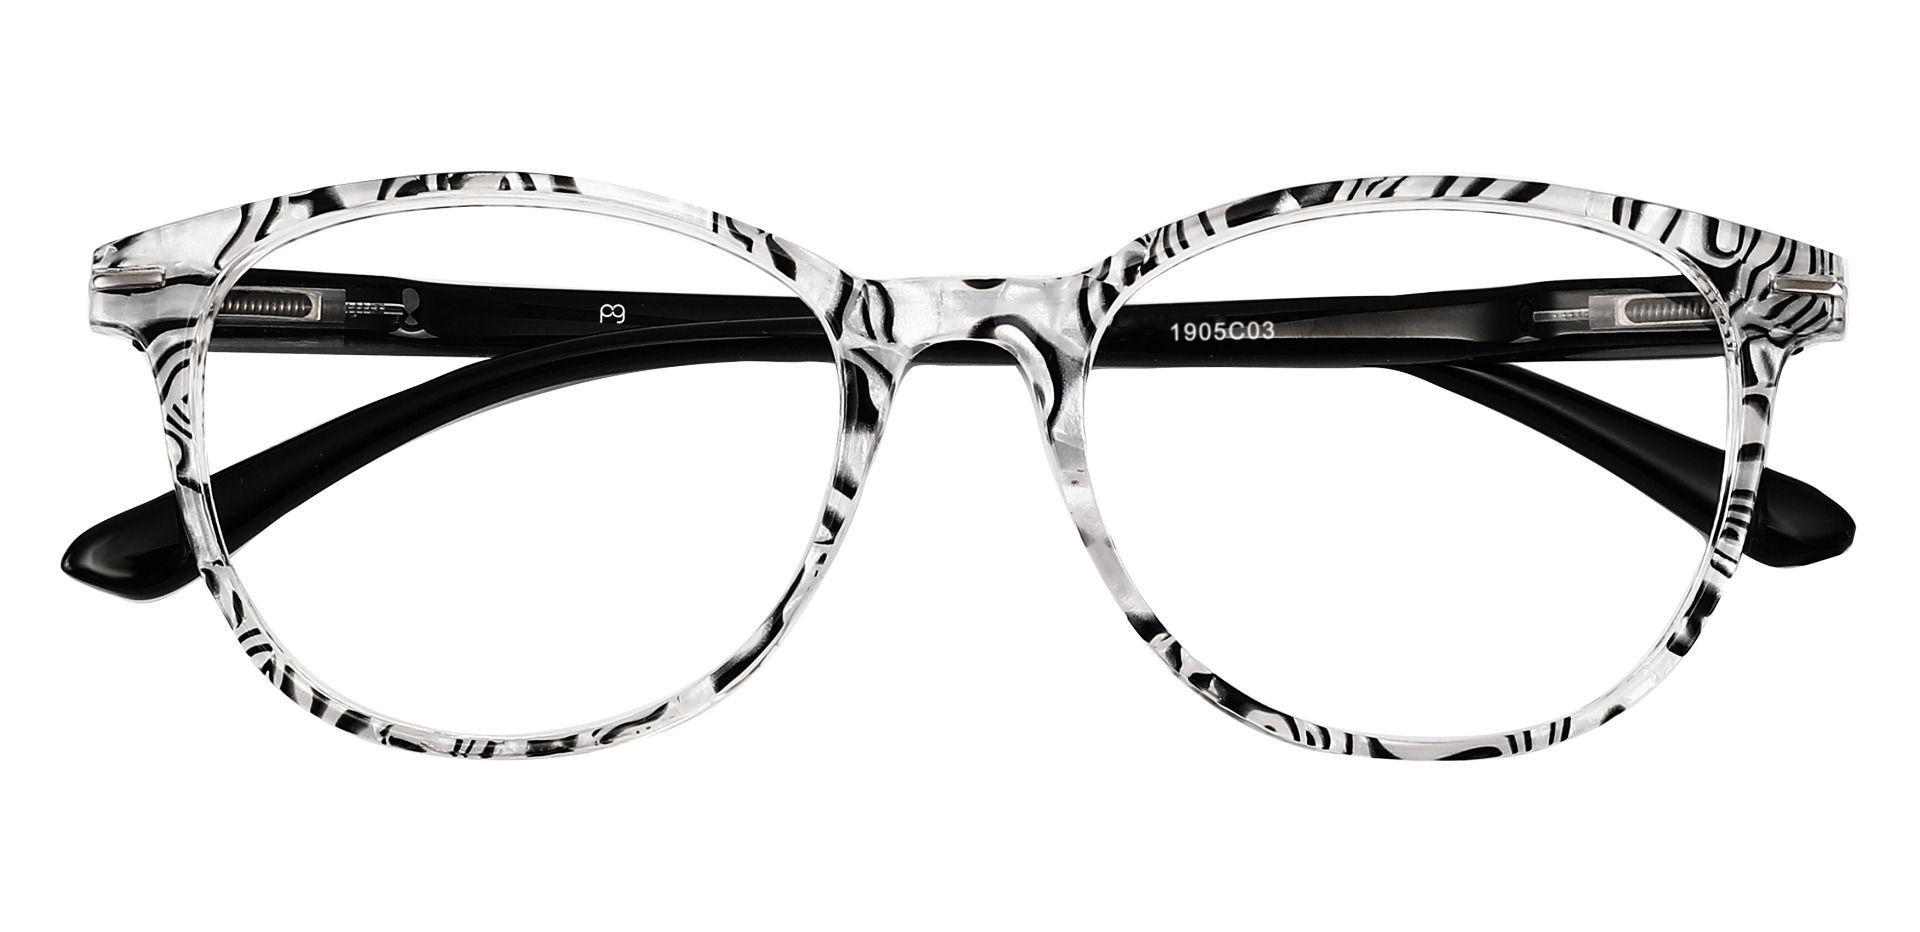 Benton Oval Progressive Glasses - Two